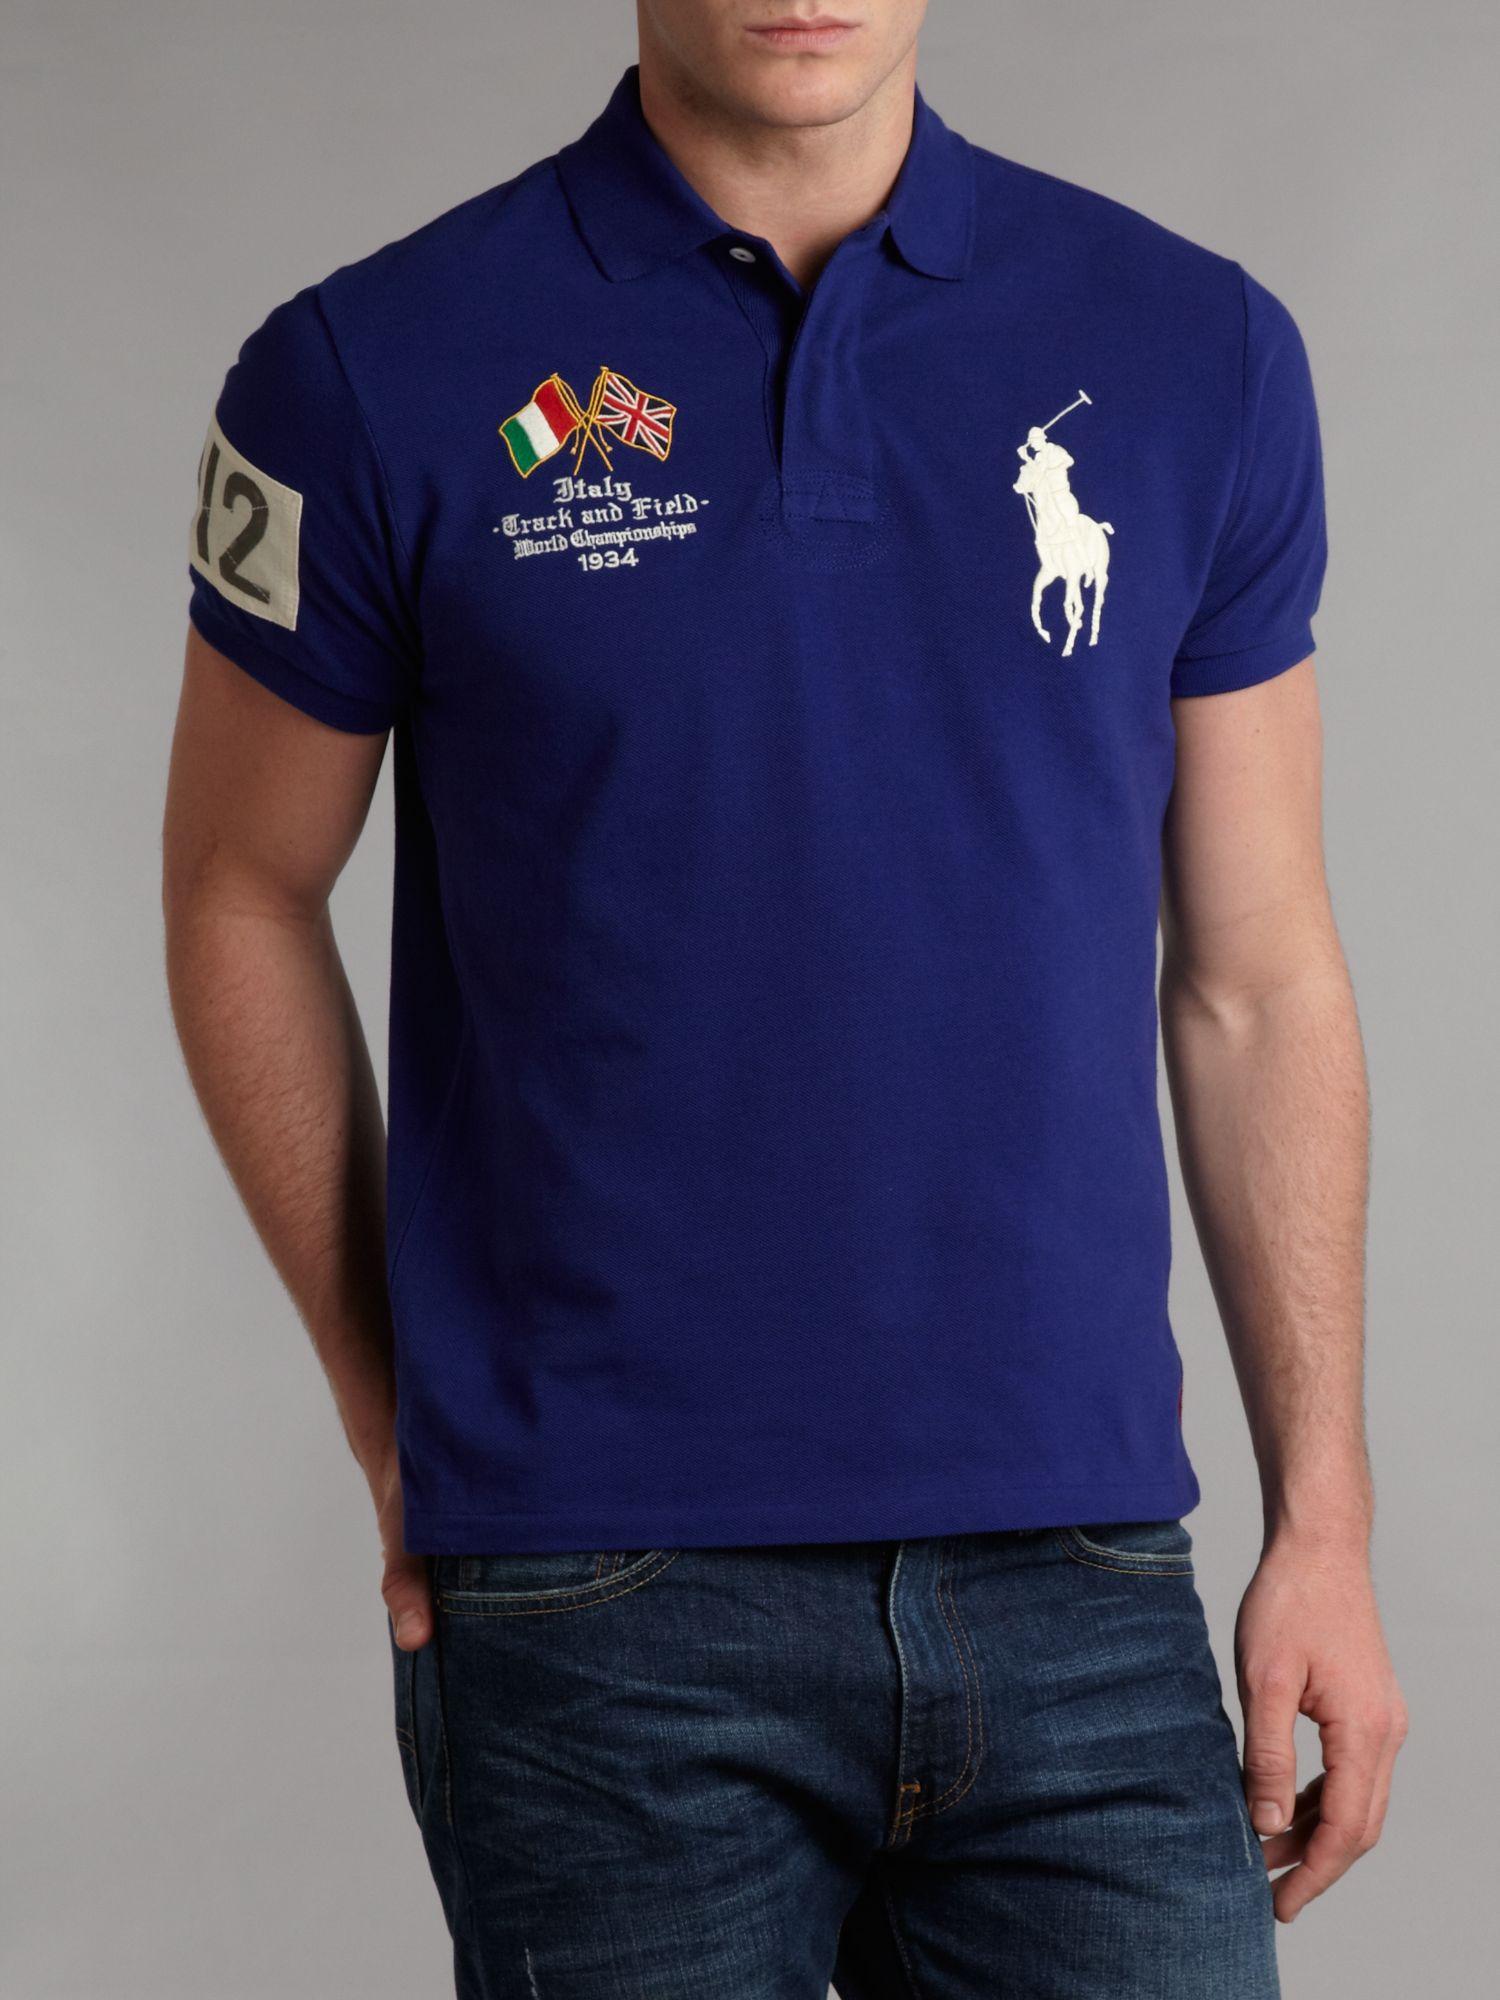 Code Polo Ralph Sale D0ba9 Promo For 9689e Lauren Blue Italy Shirt MVqpSUz